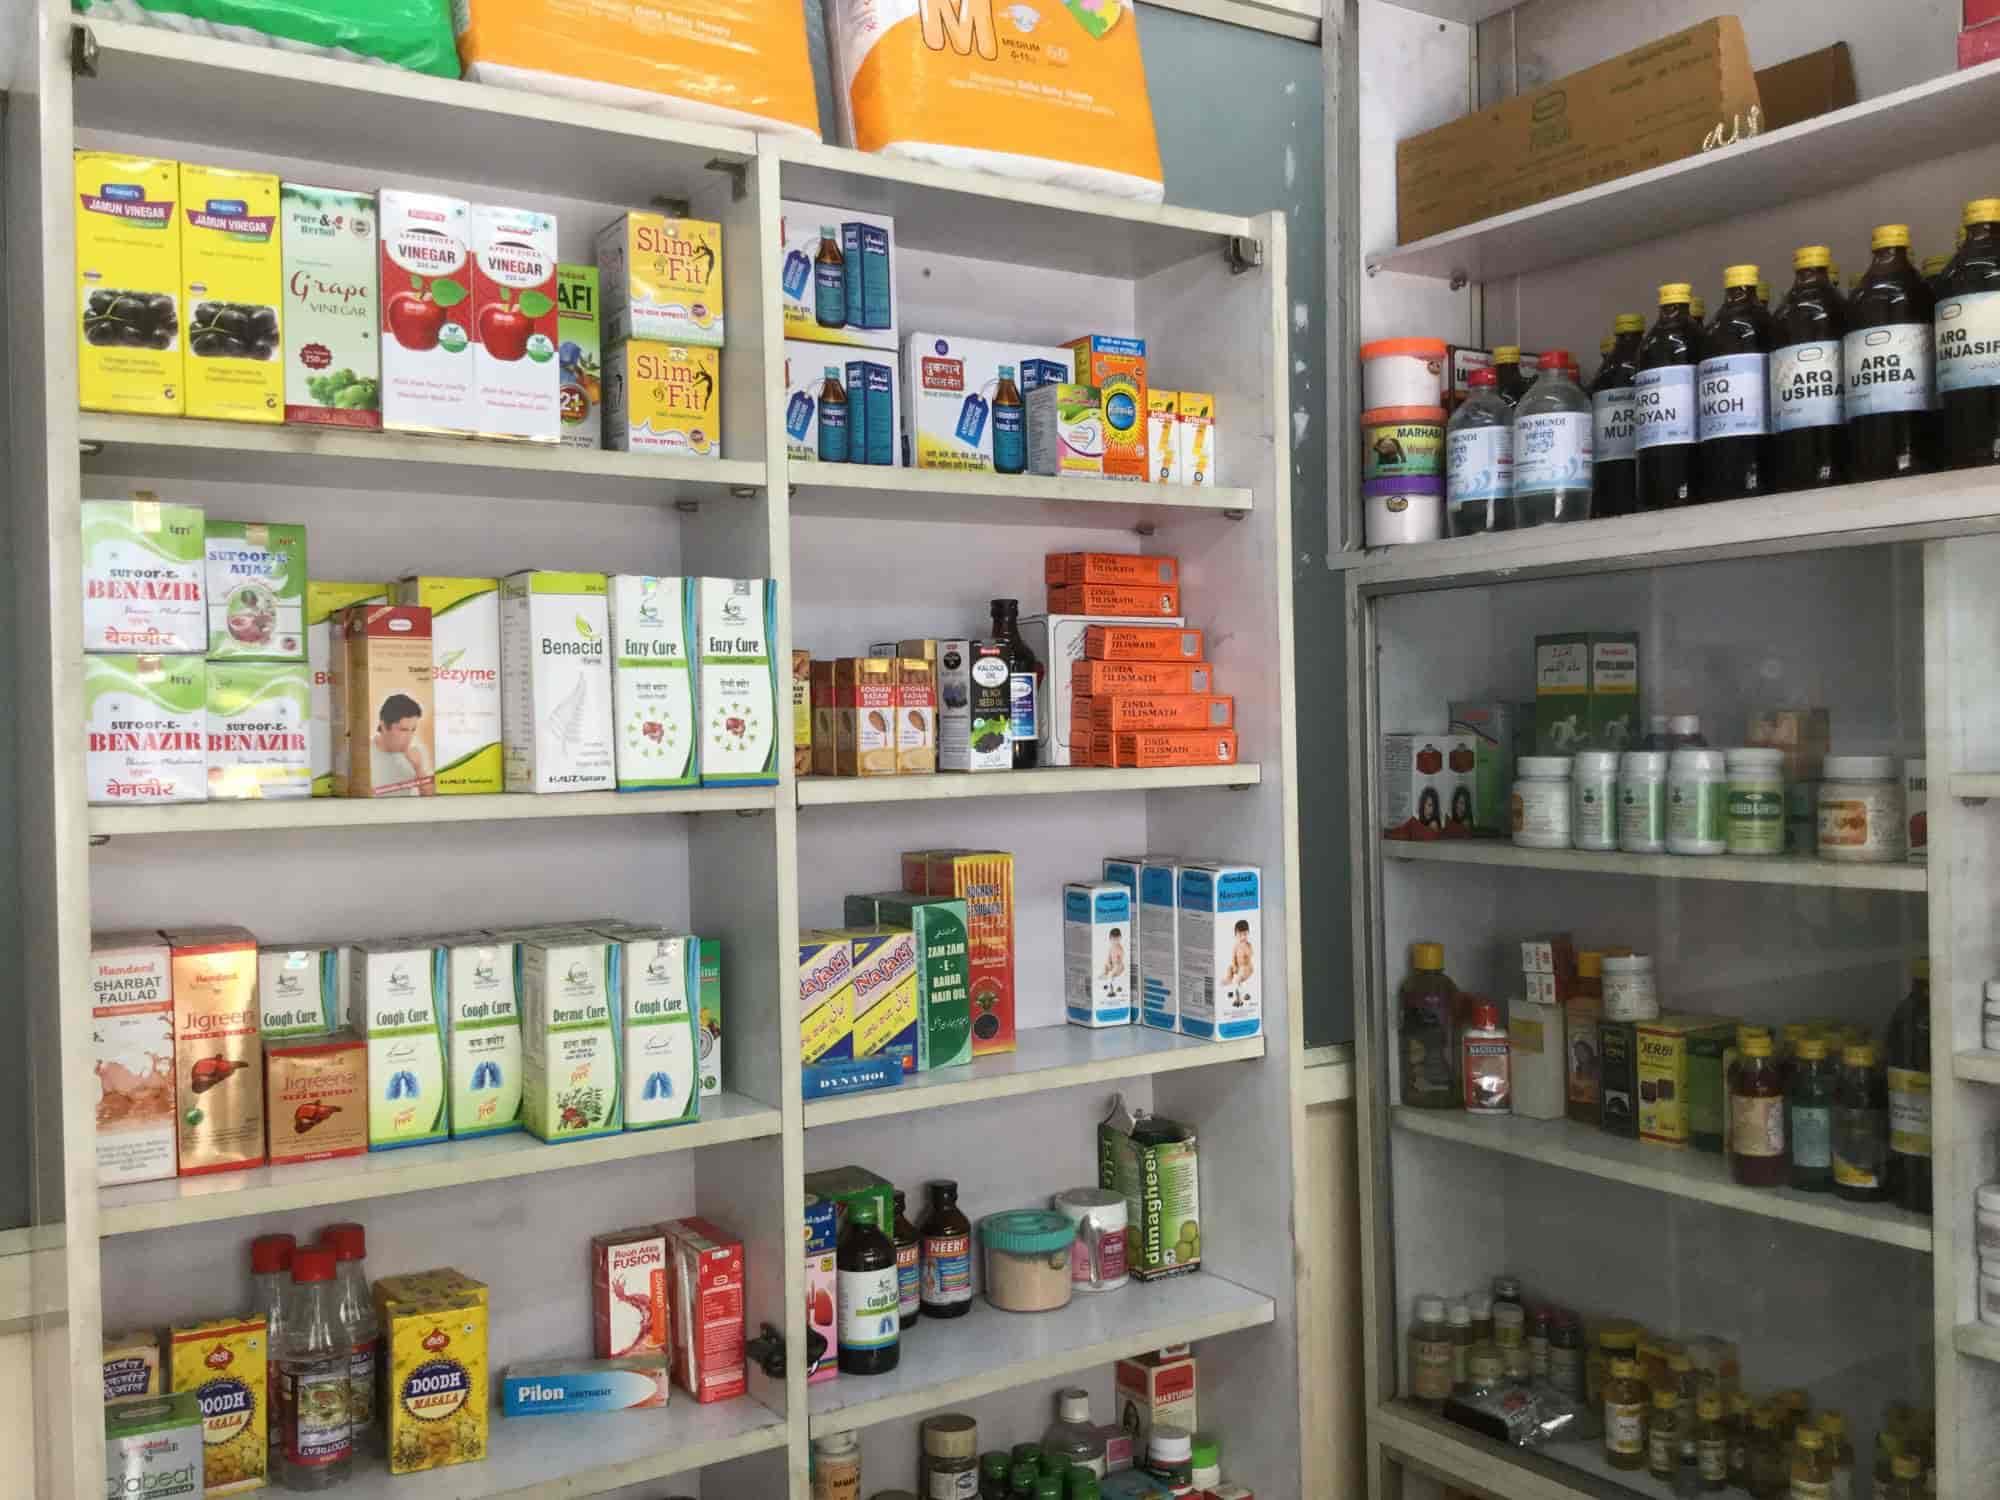 Zia Health Care - Unani Dispensary Hijama Centre, Rt Nagar - Cupping